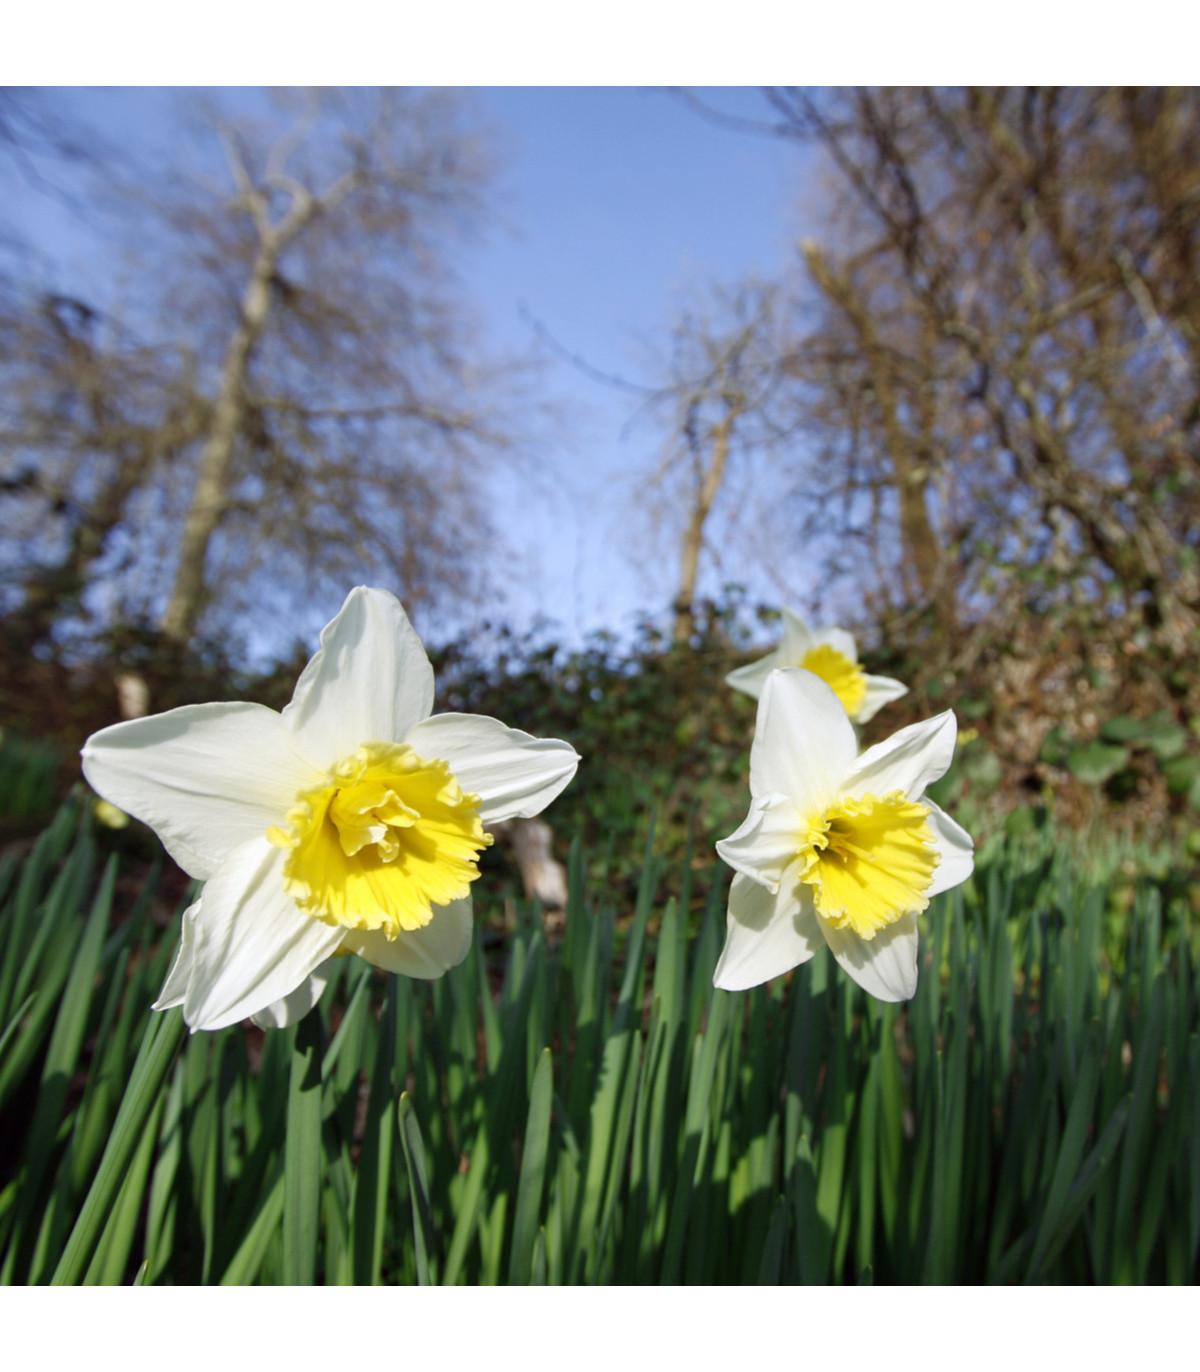 Narcis Pueblo - Narcissus - cibuľoviny - 3 ks